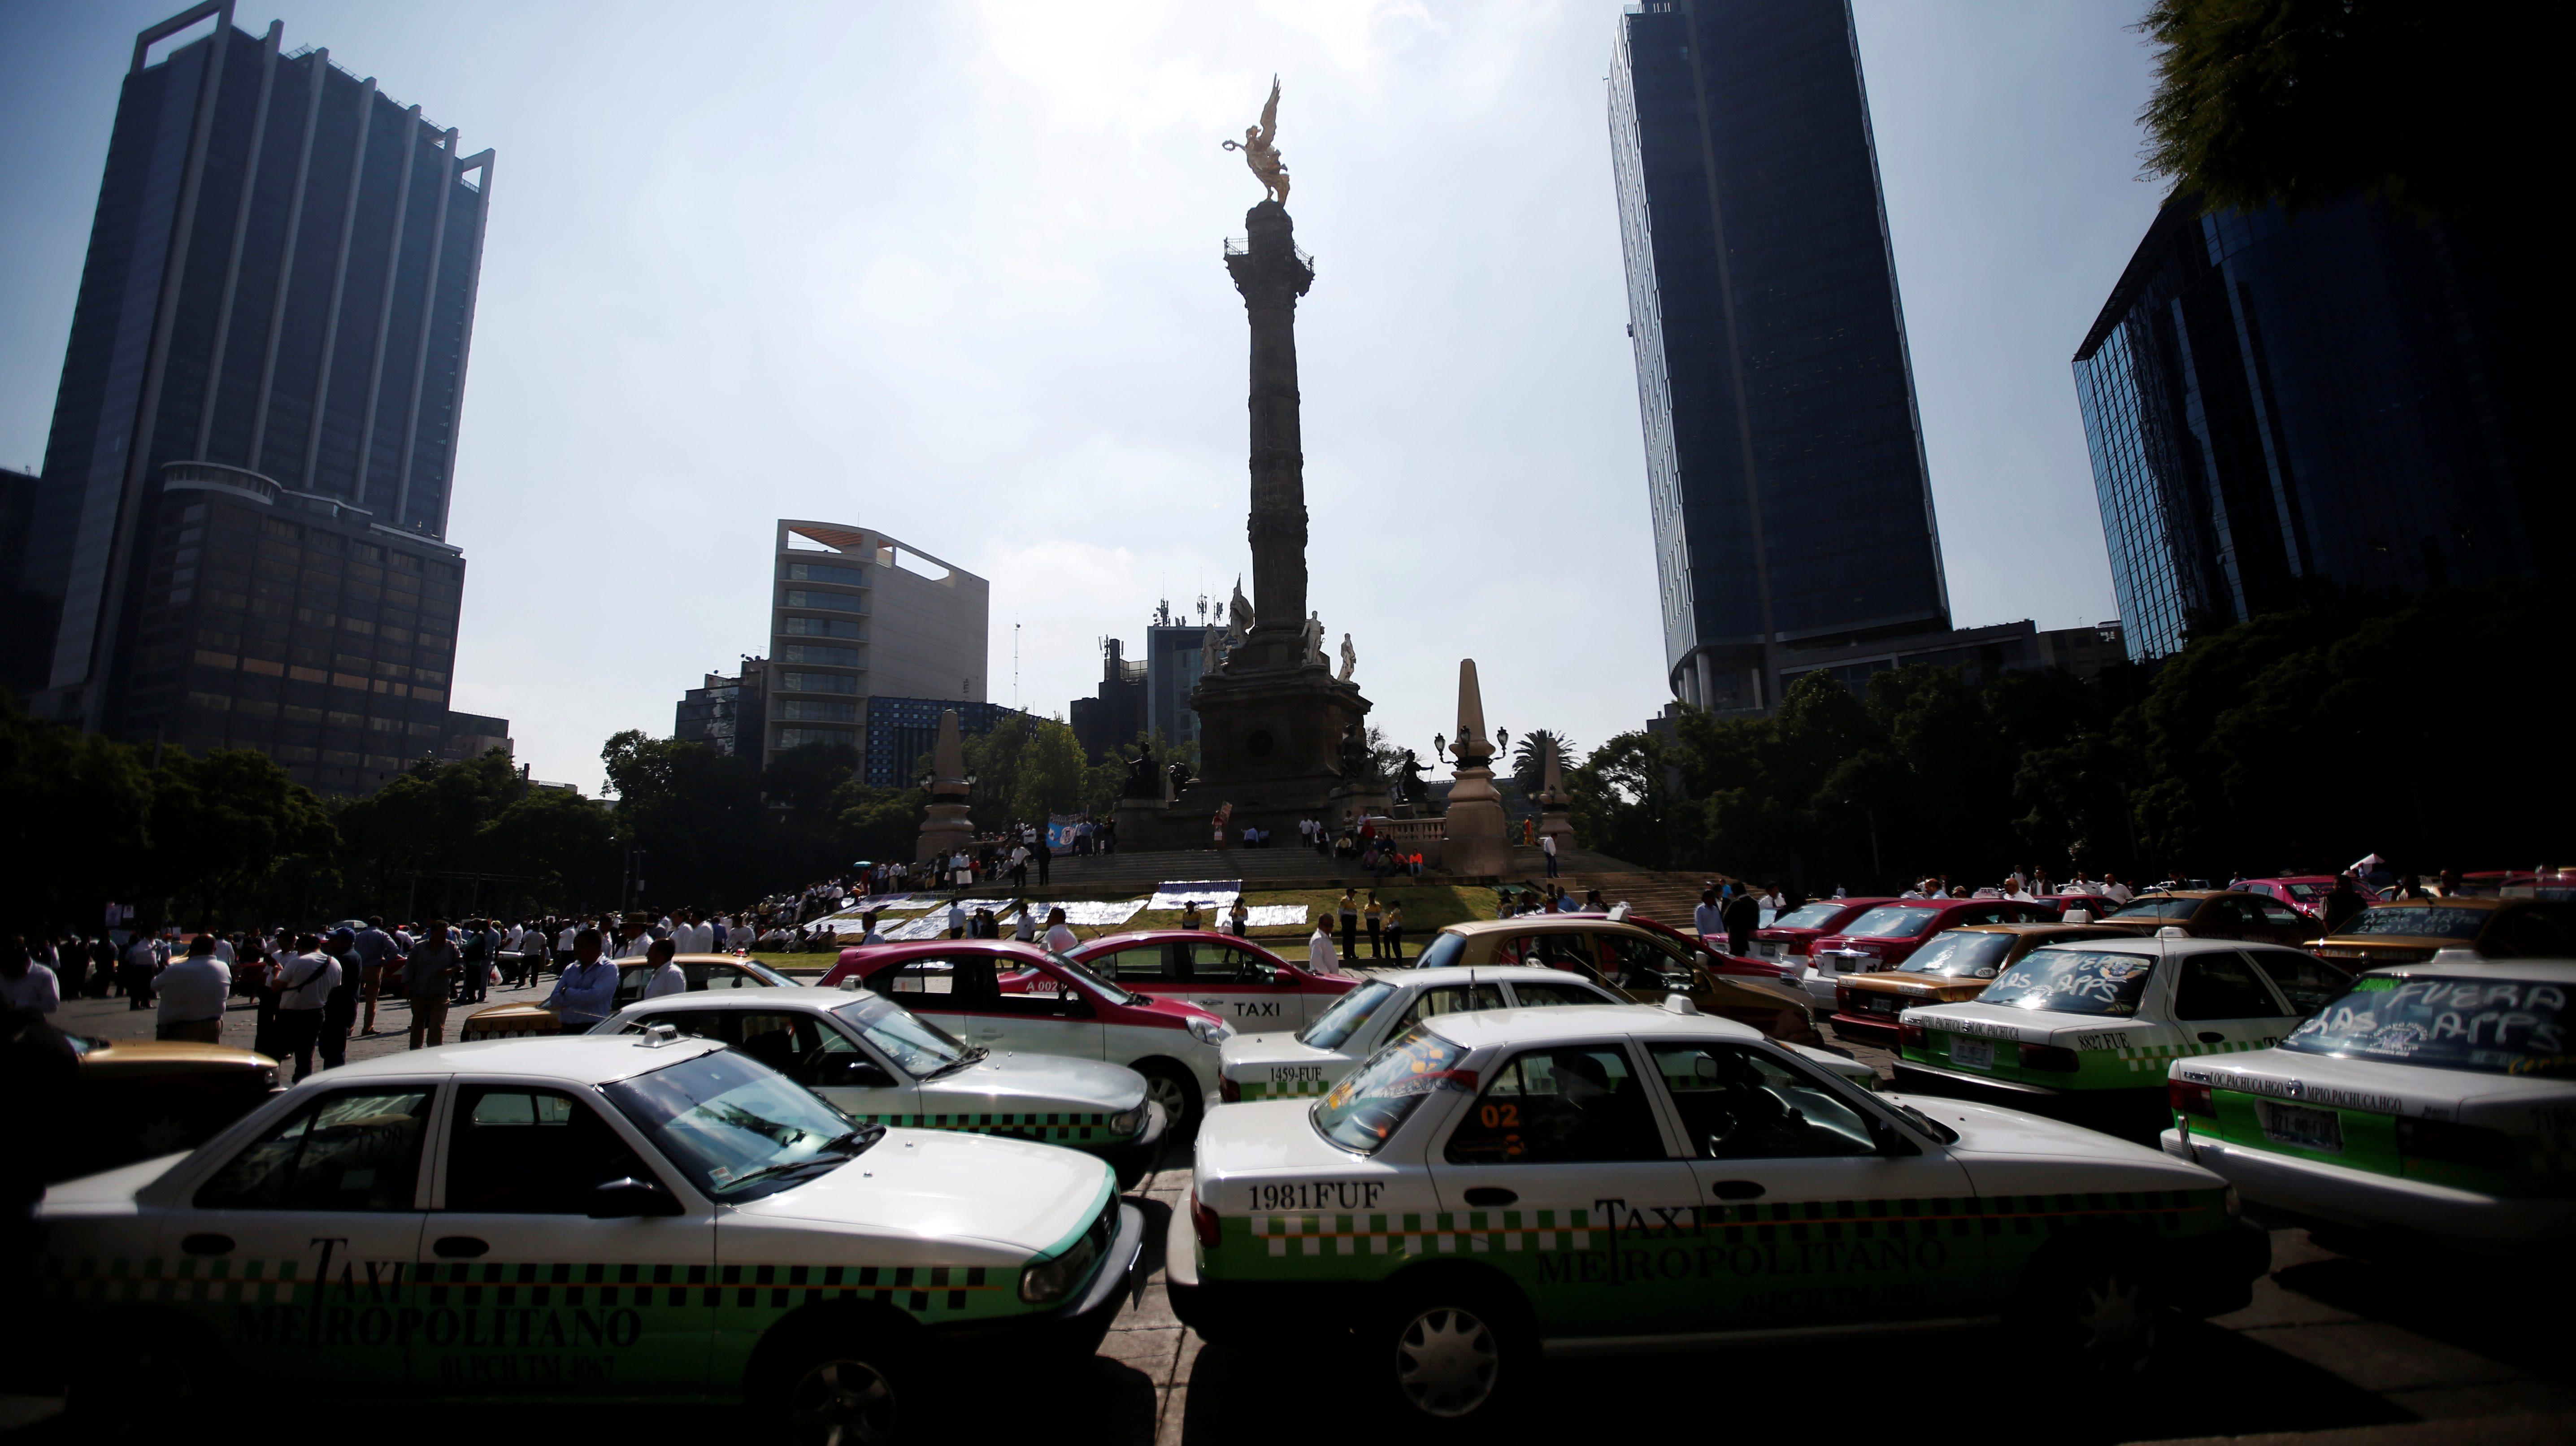 Taxis in Mexico City, Mexico